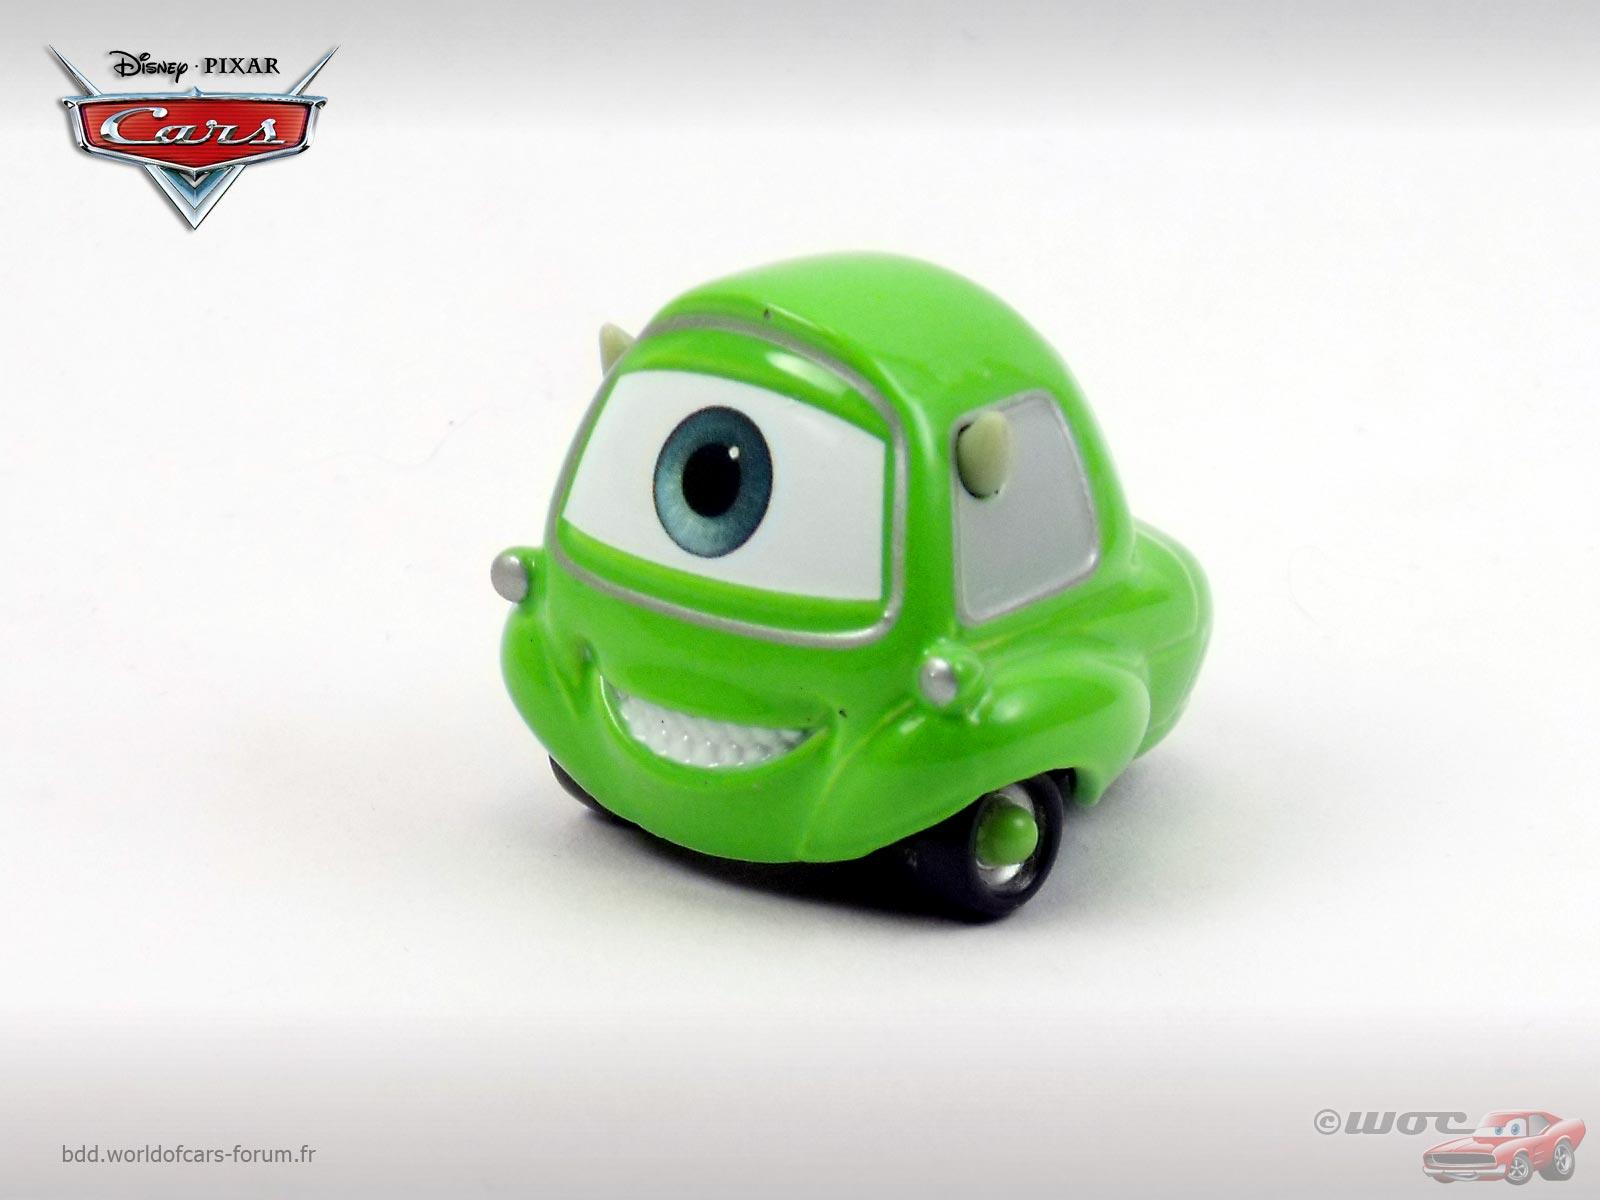 World of cars pr 233 sentation du personnage mike wazowski